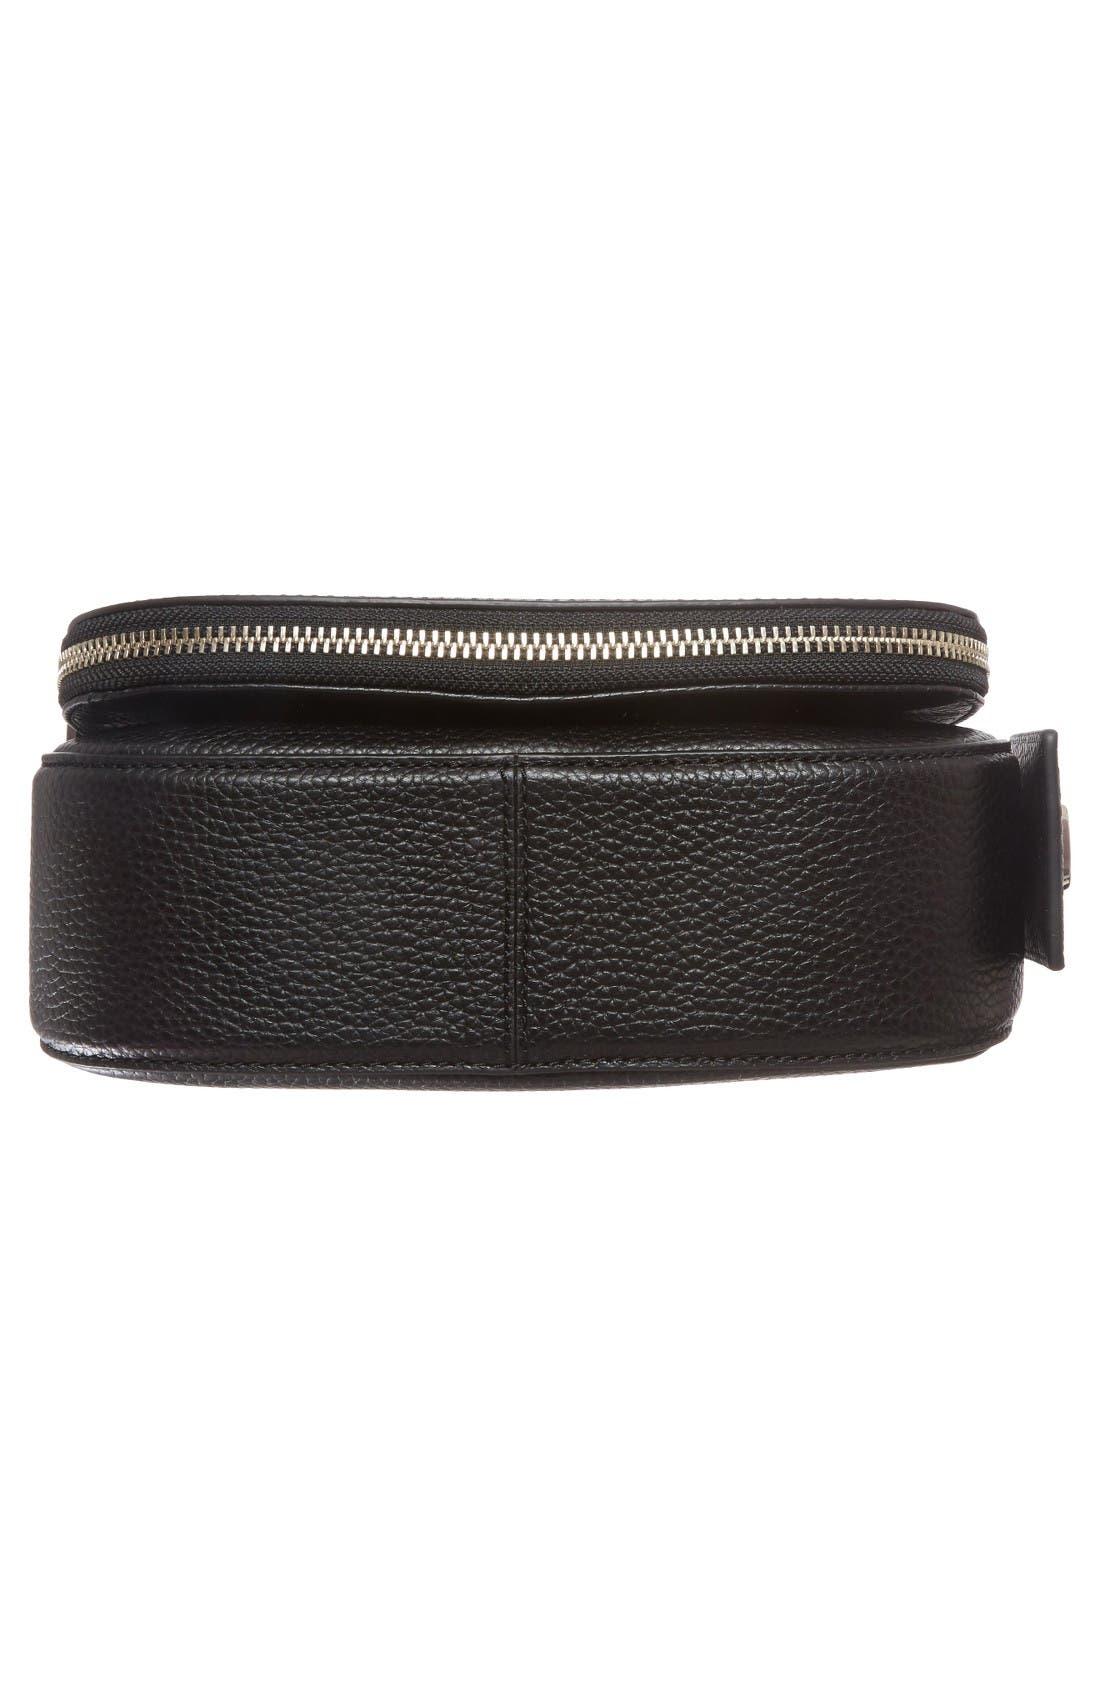 Small Nomad Gotham Leather Crossbody Bag,                             Alternate thumbnail 6, color,                             Black